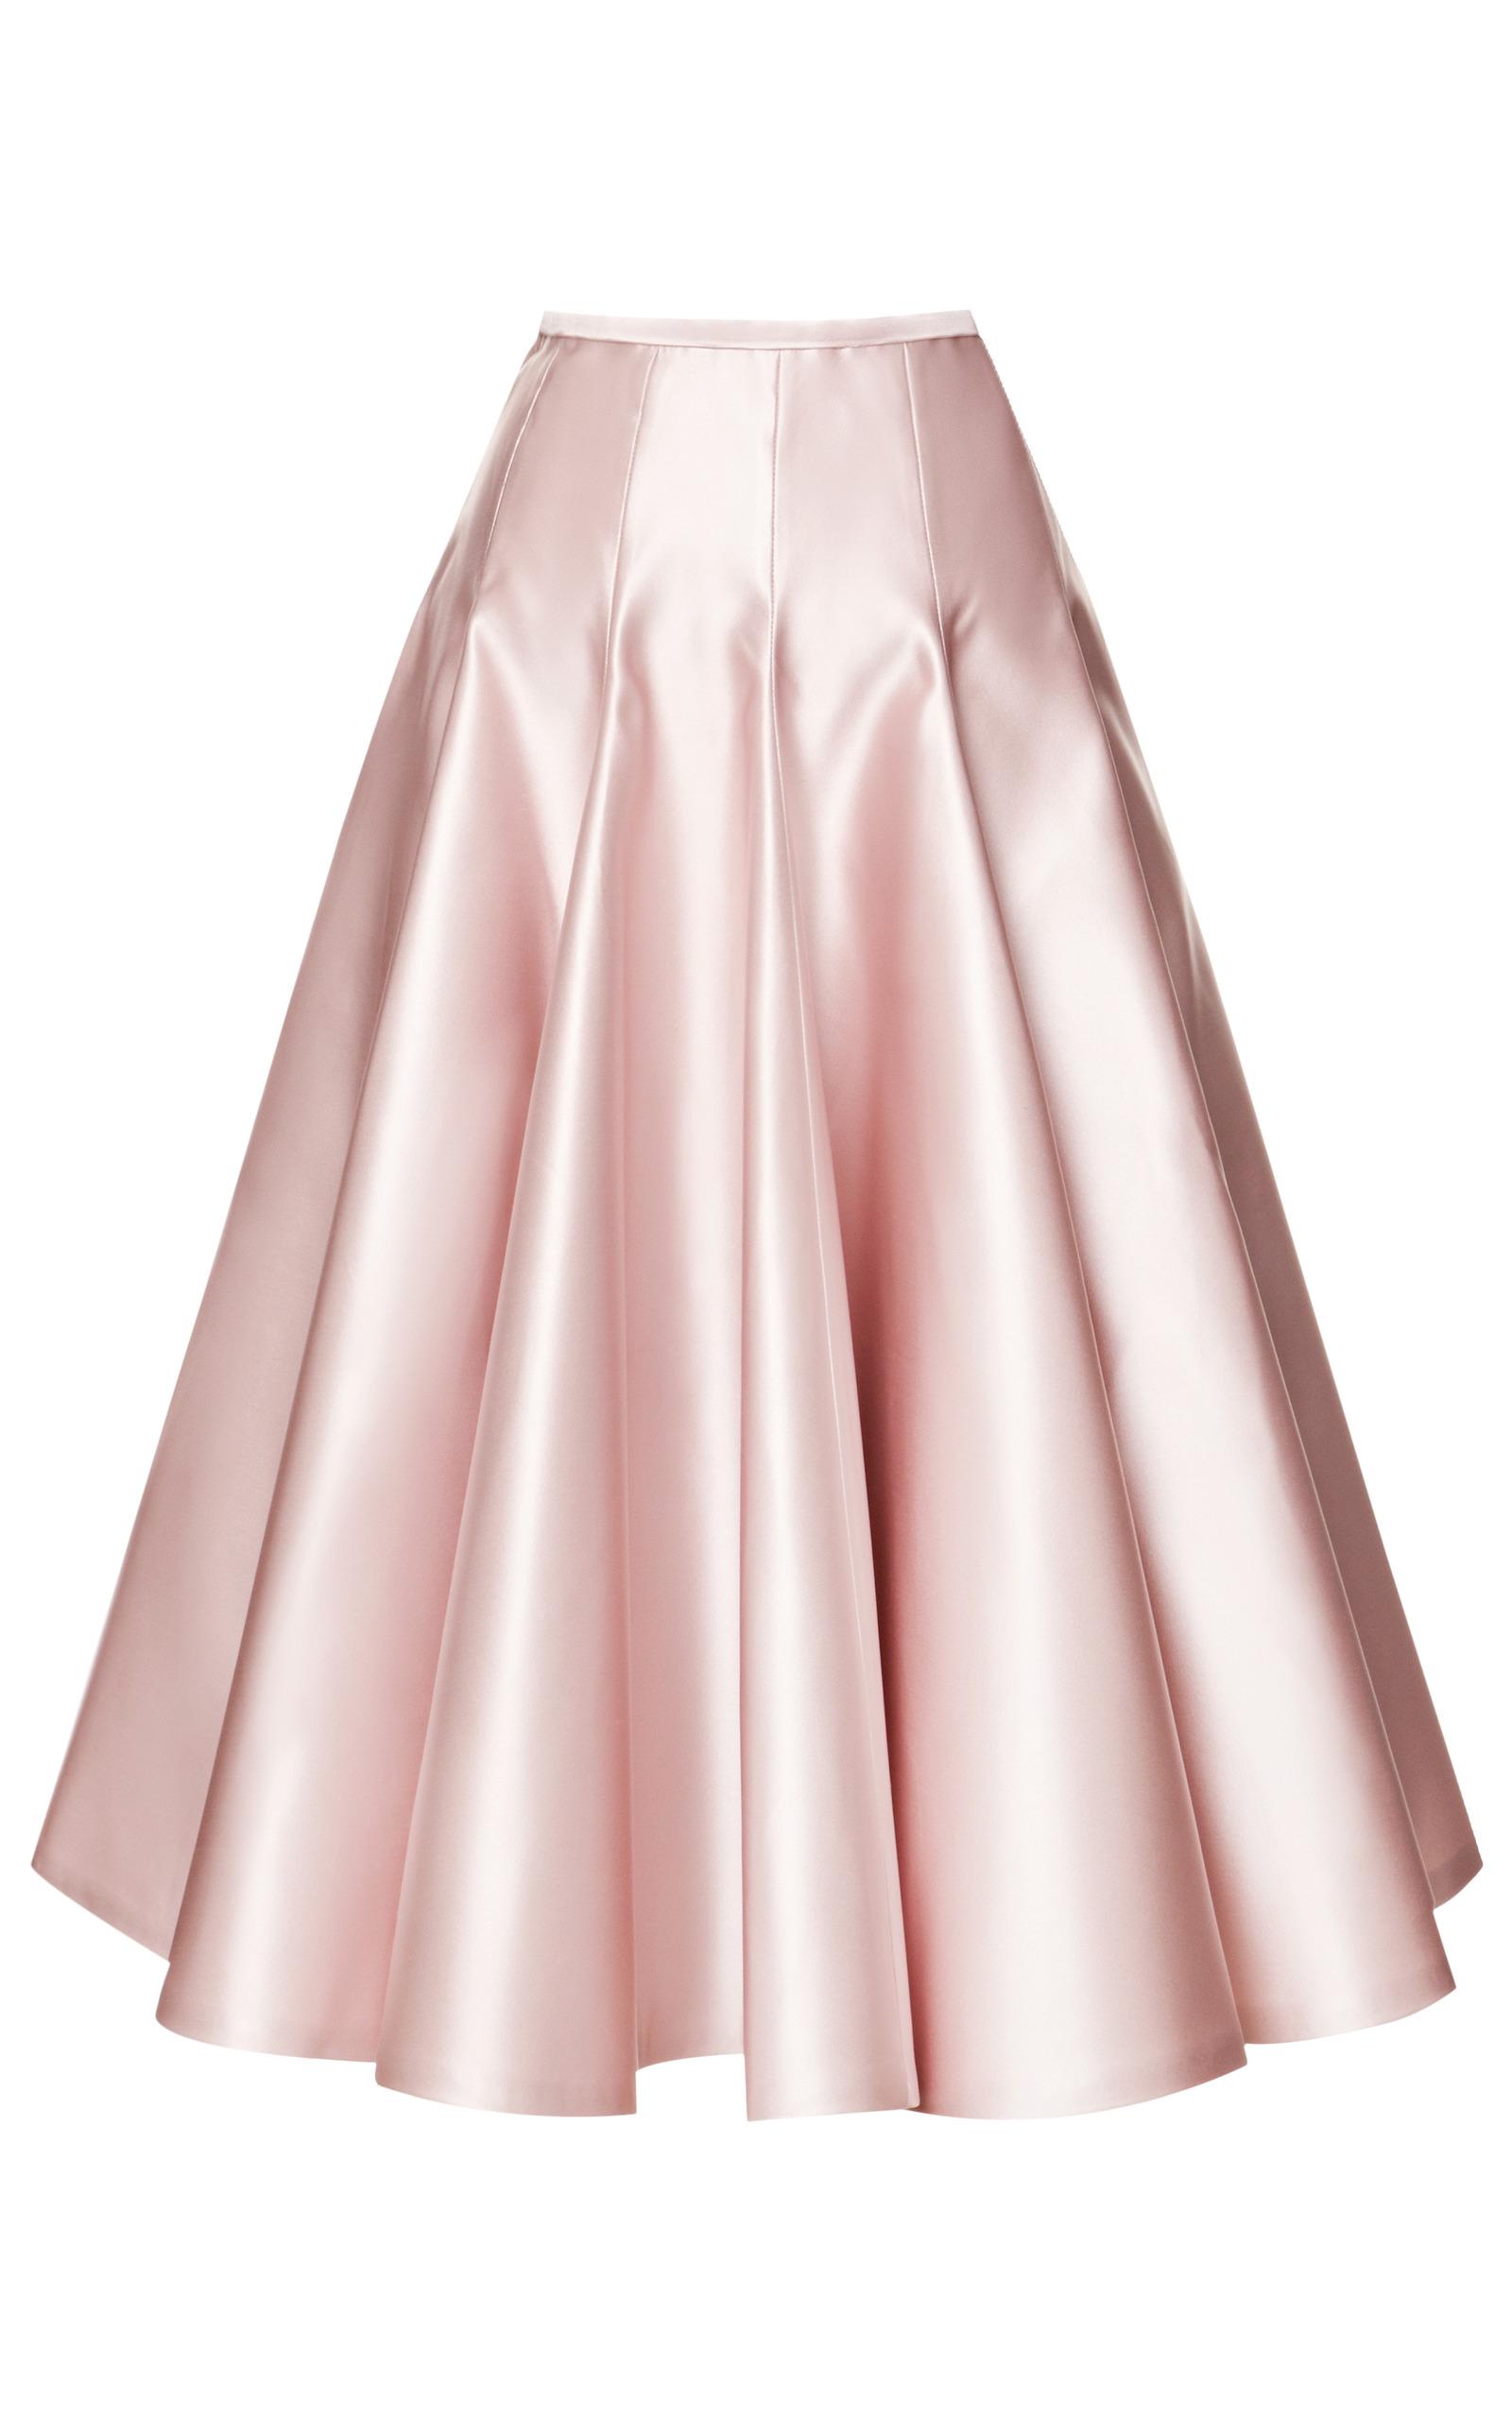 Duchesse Satin A-Line Skirt by Rochas | Moda Operandi